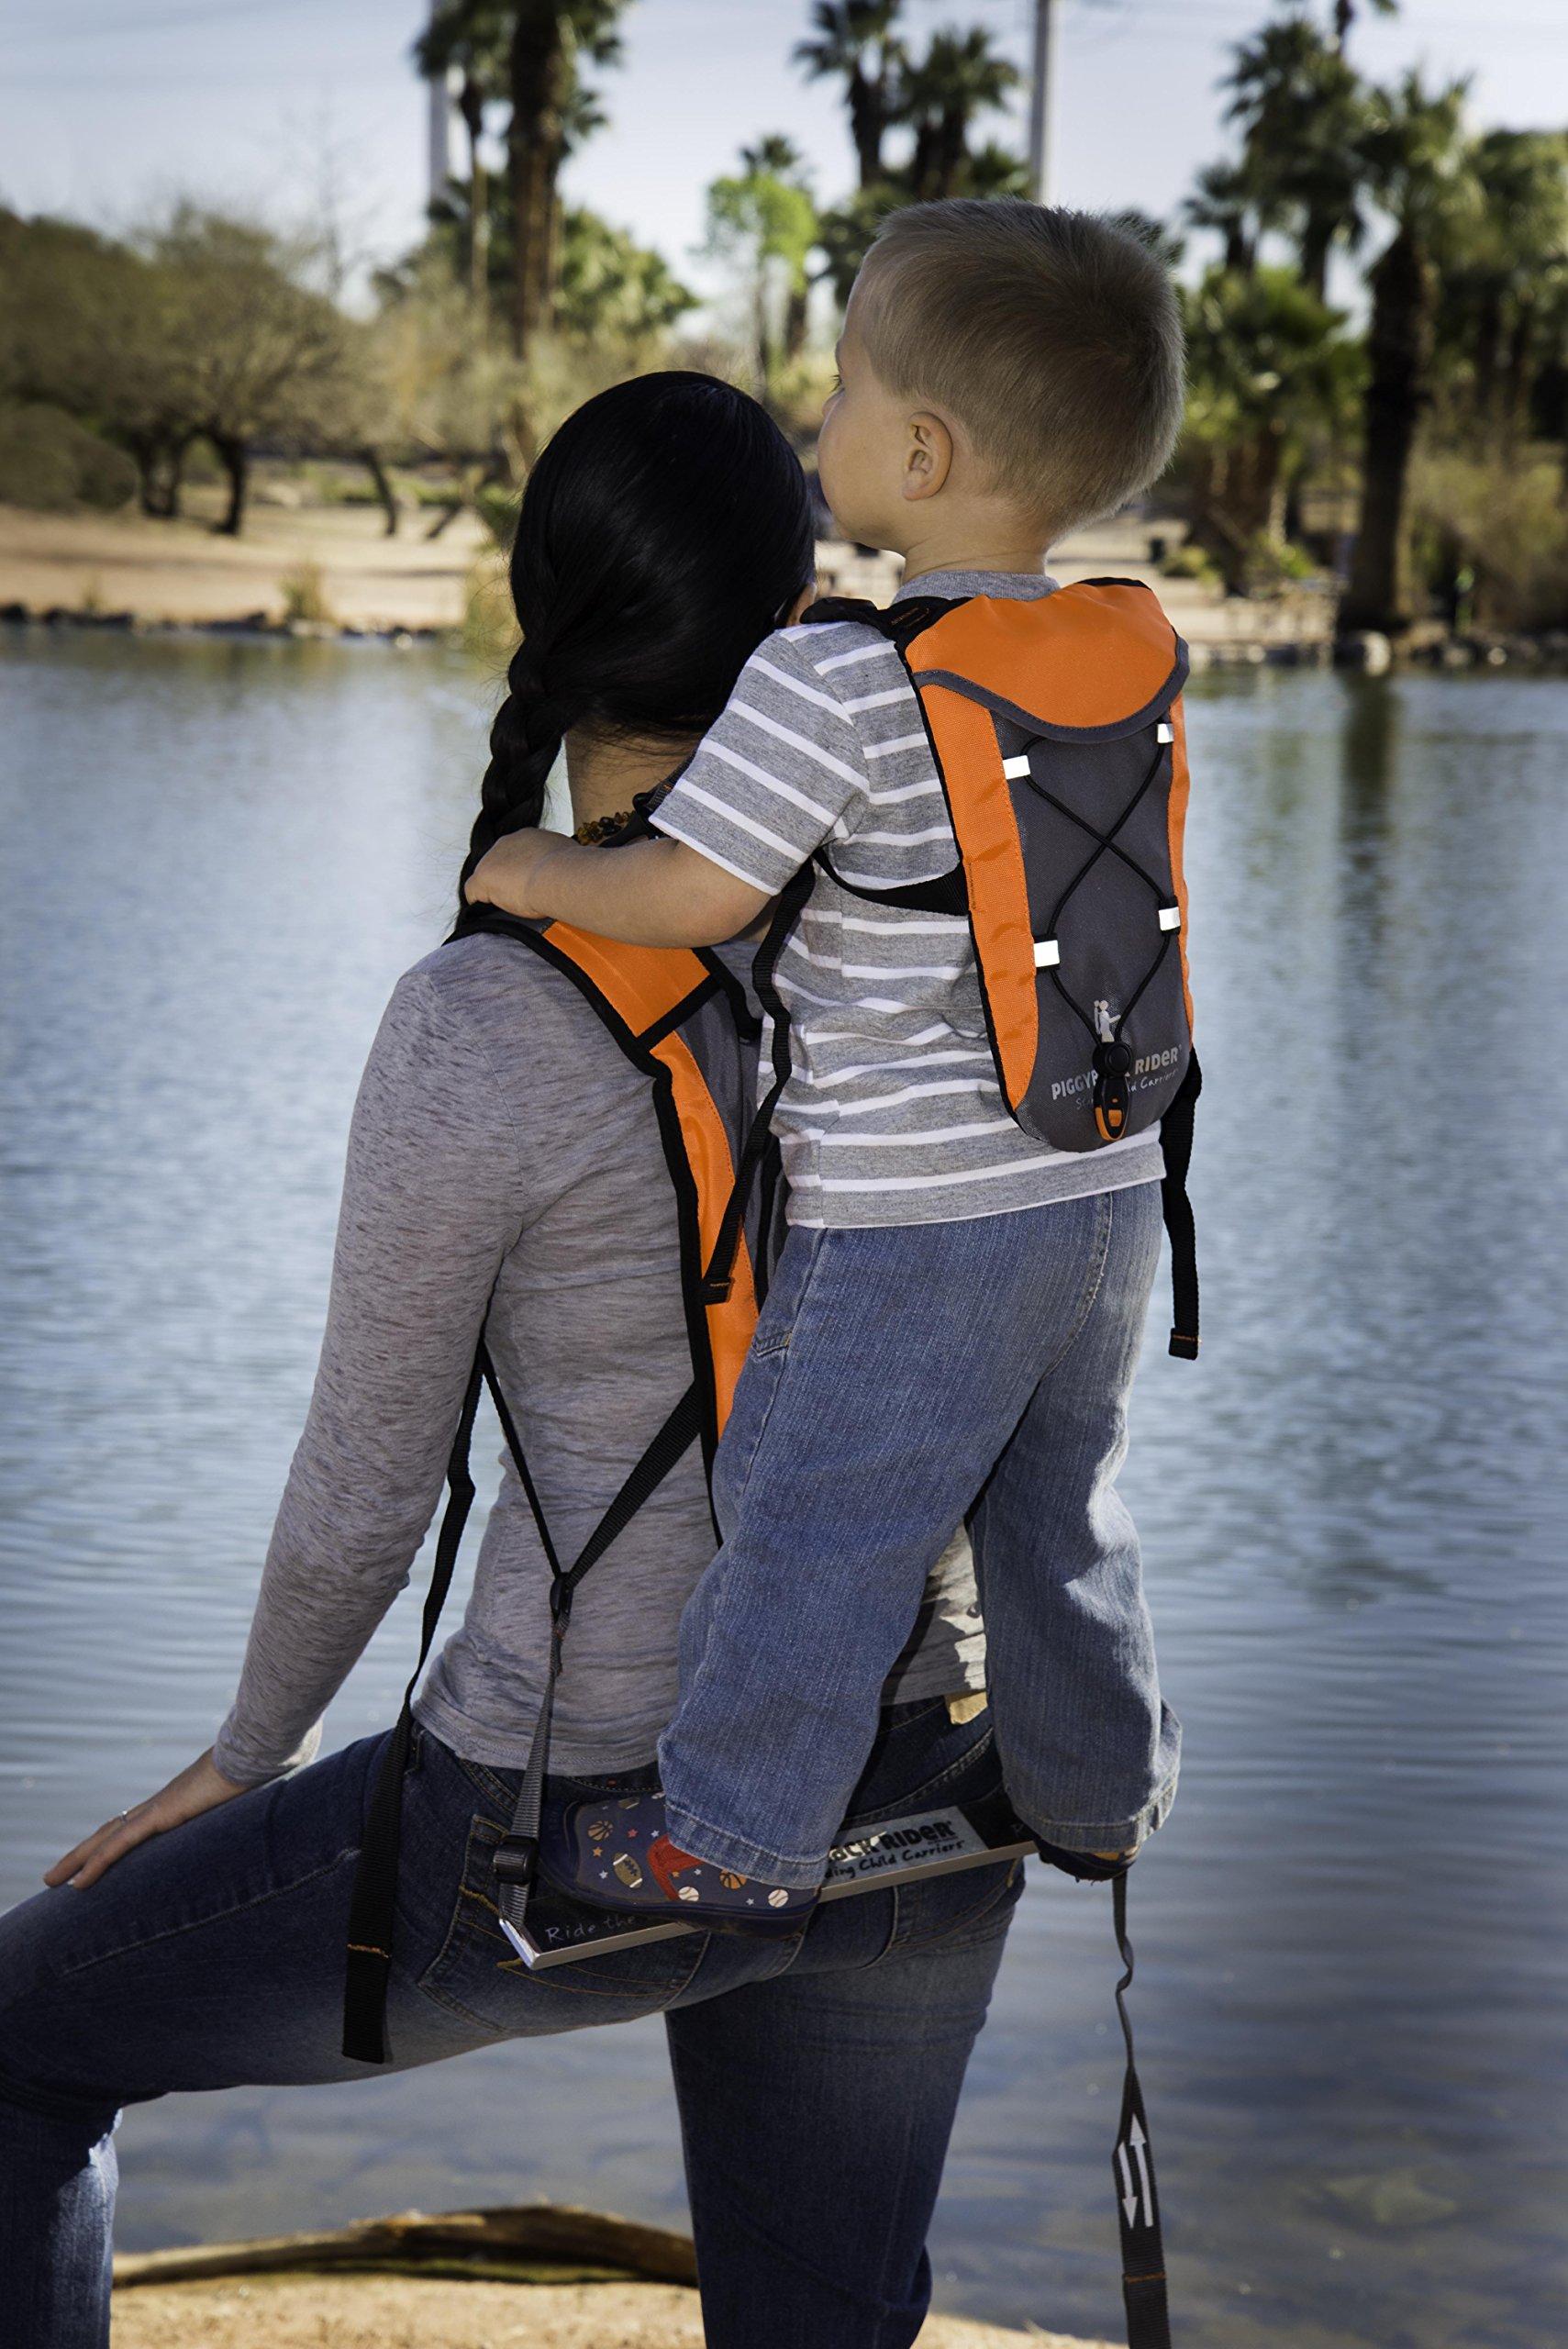 Piggyback Rider Child Safety Harness Backpack - Orange